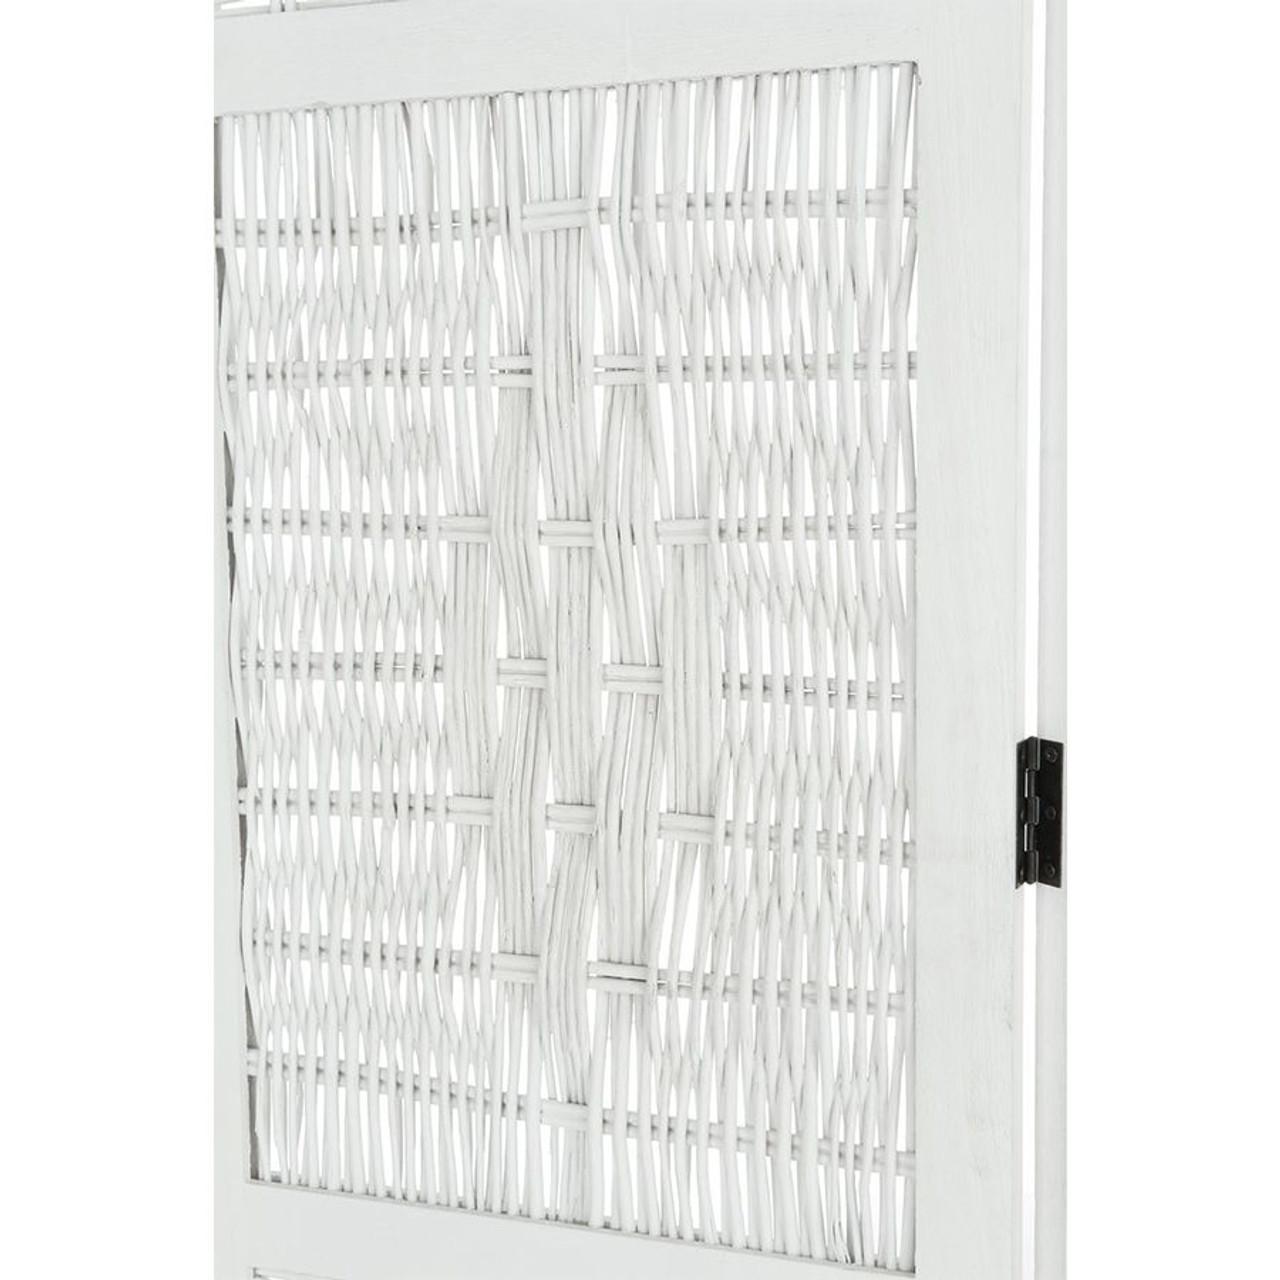 4 Panel Room Divider Wicker White Color